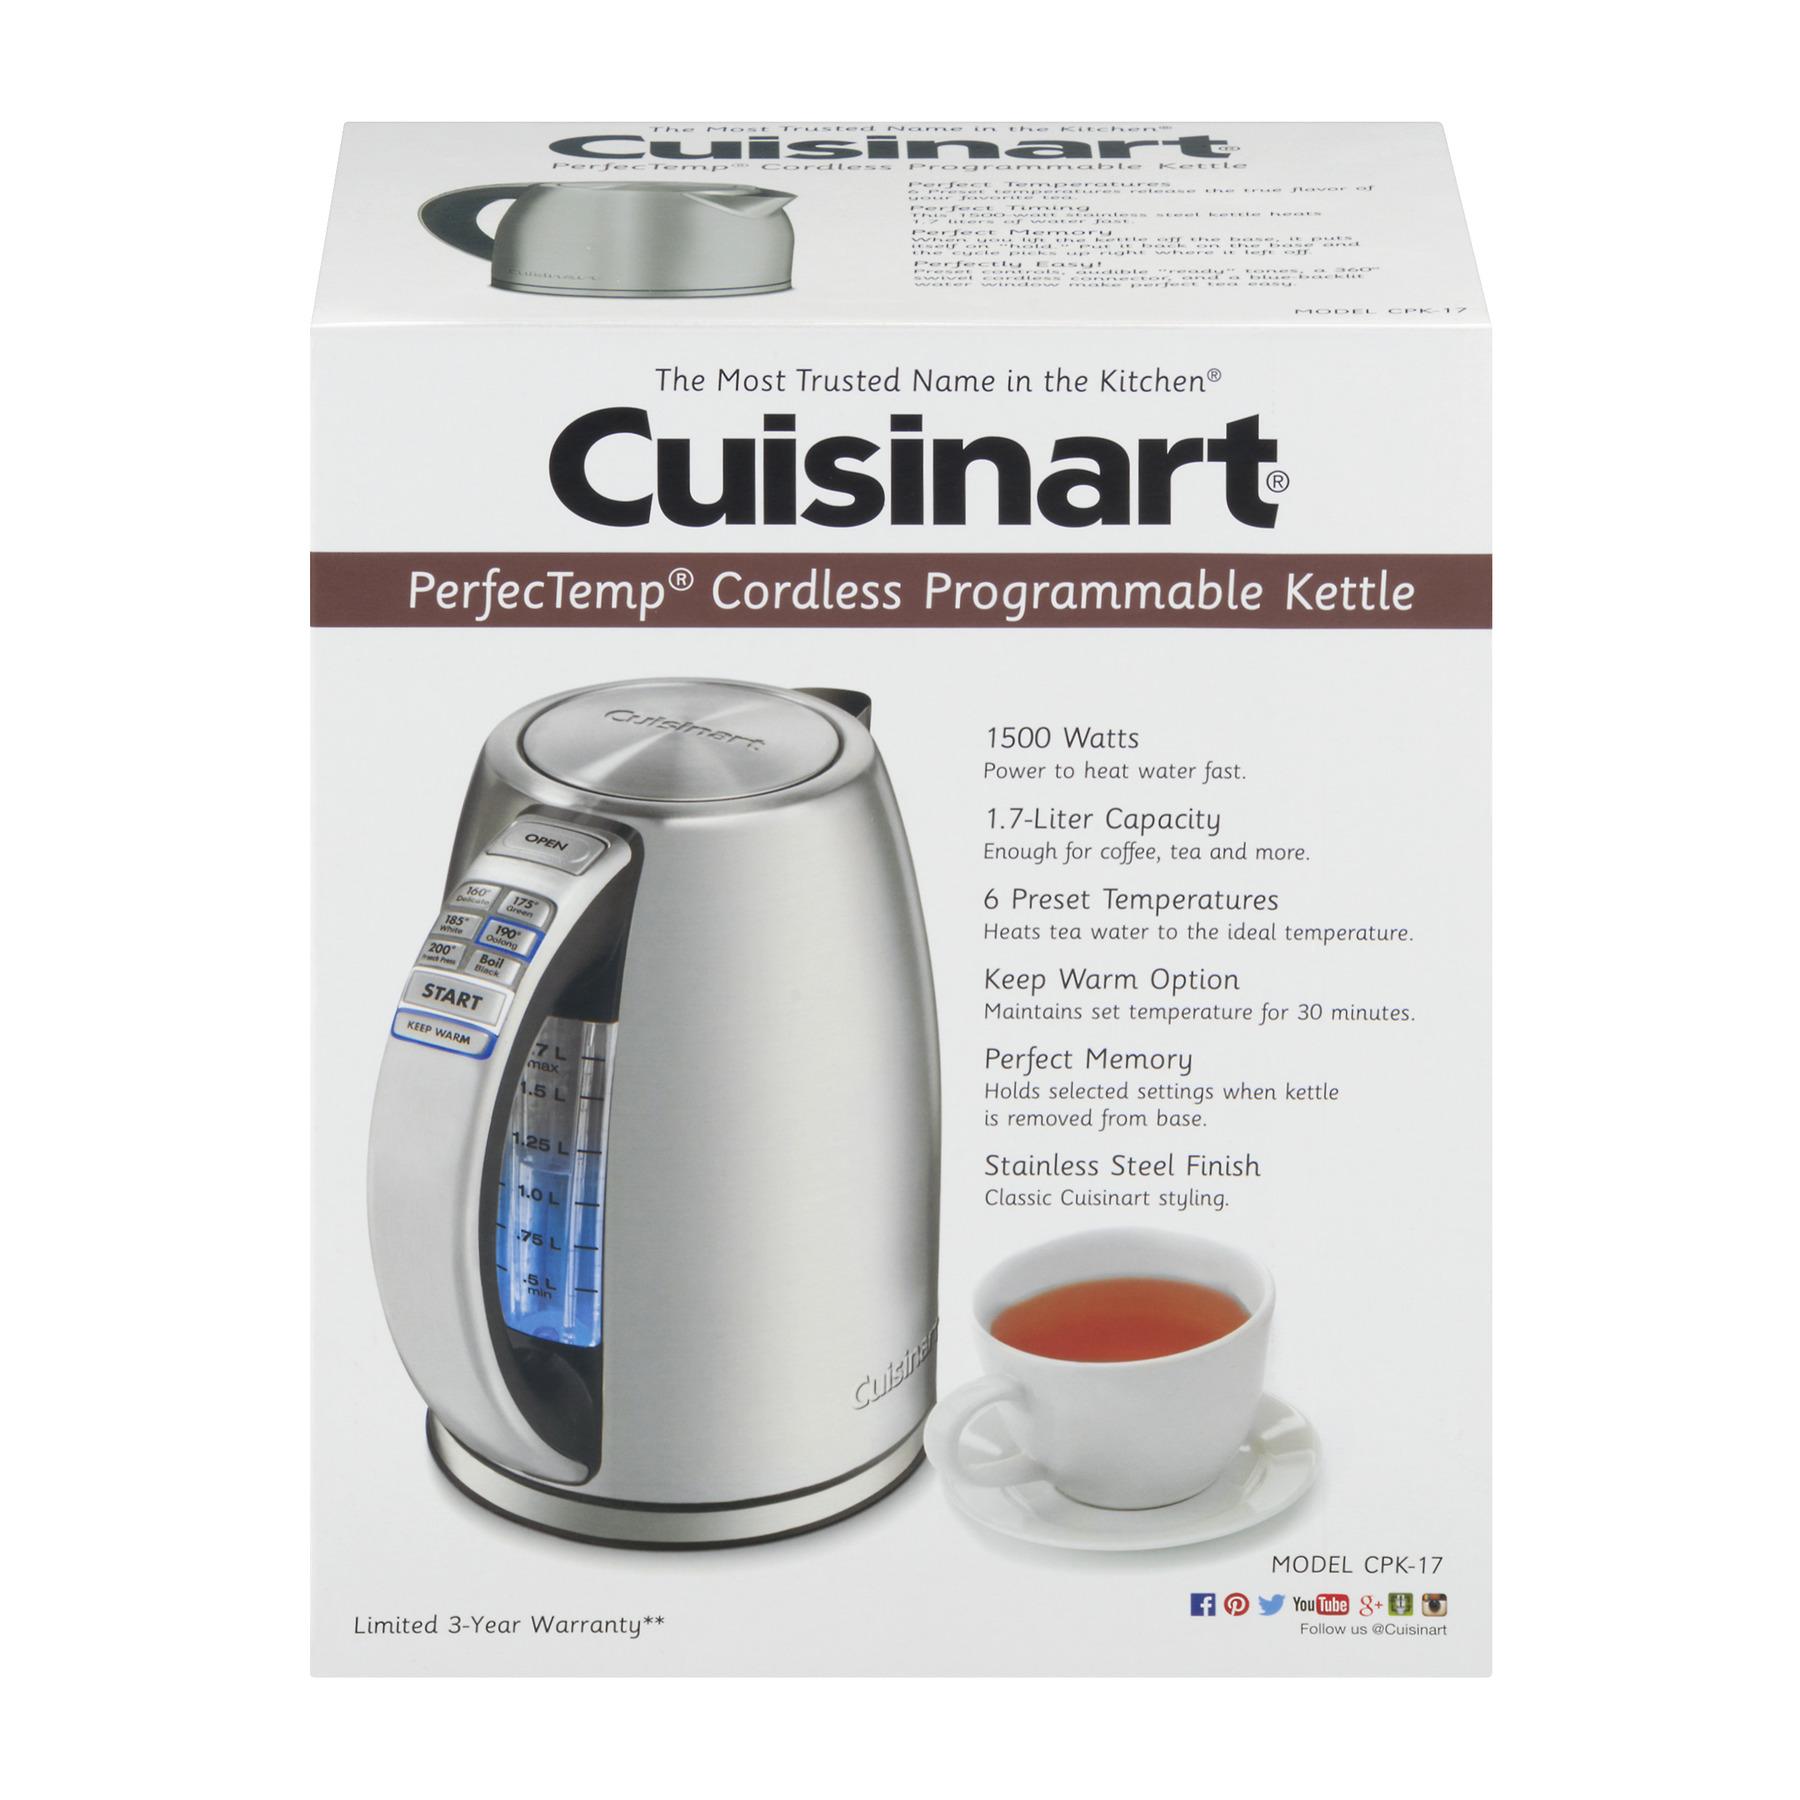 Cuisinart Perfec Temp Cordless Programmable Kettle, 1.0 CT